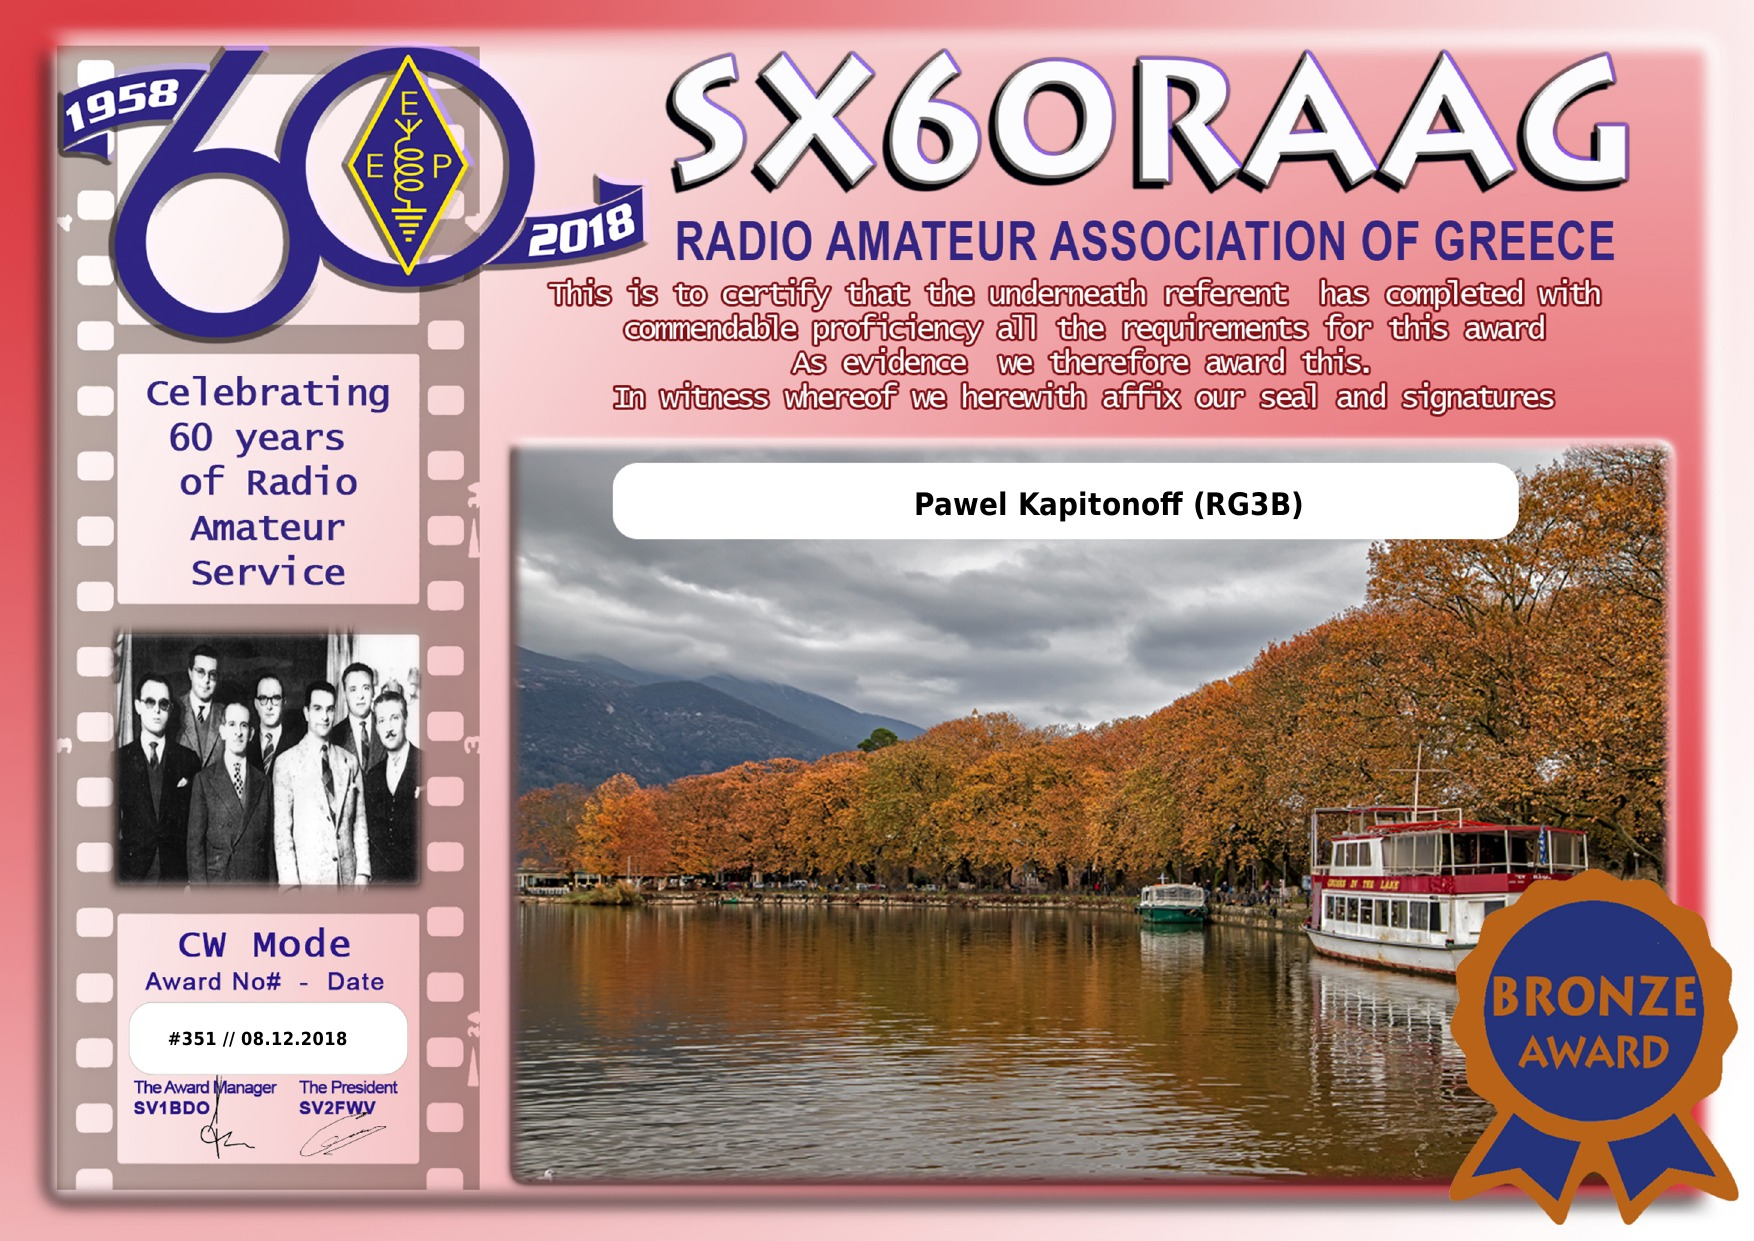 Нажмите на изображение для увеличения.  Название:raag60-cwbronze-351.jpg Просмотров:5 Размер:537.7 Кб ID:224508